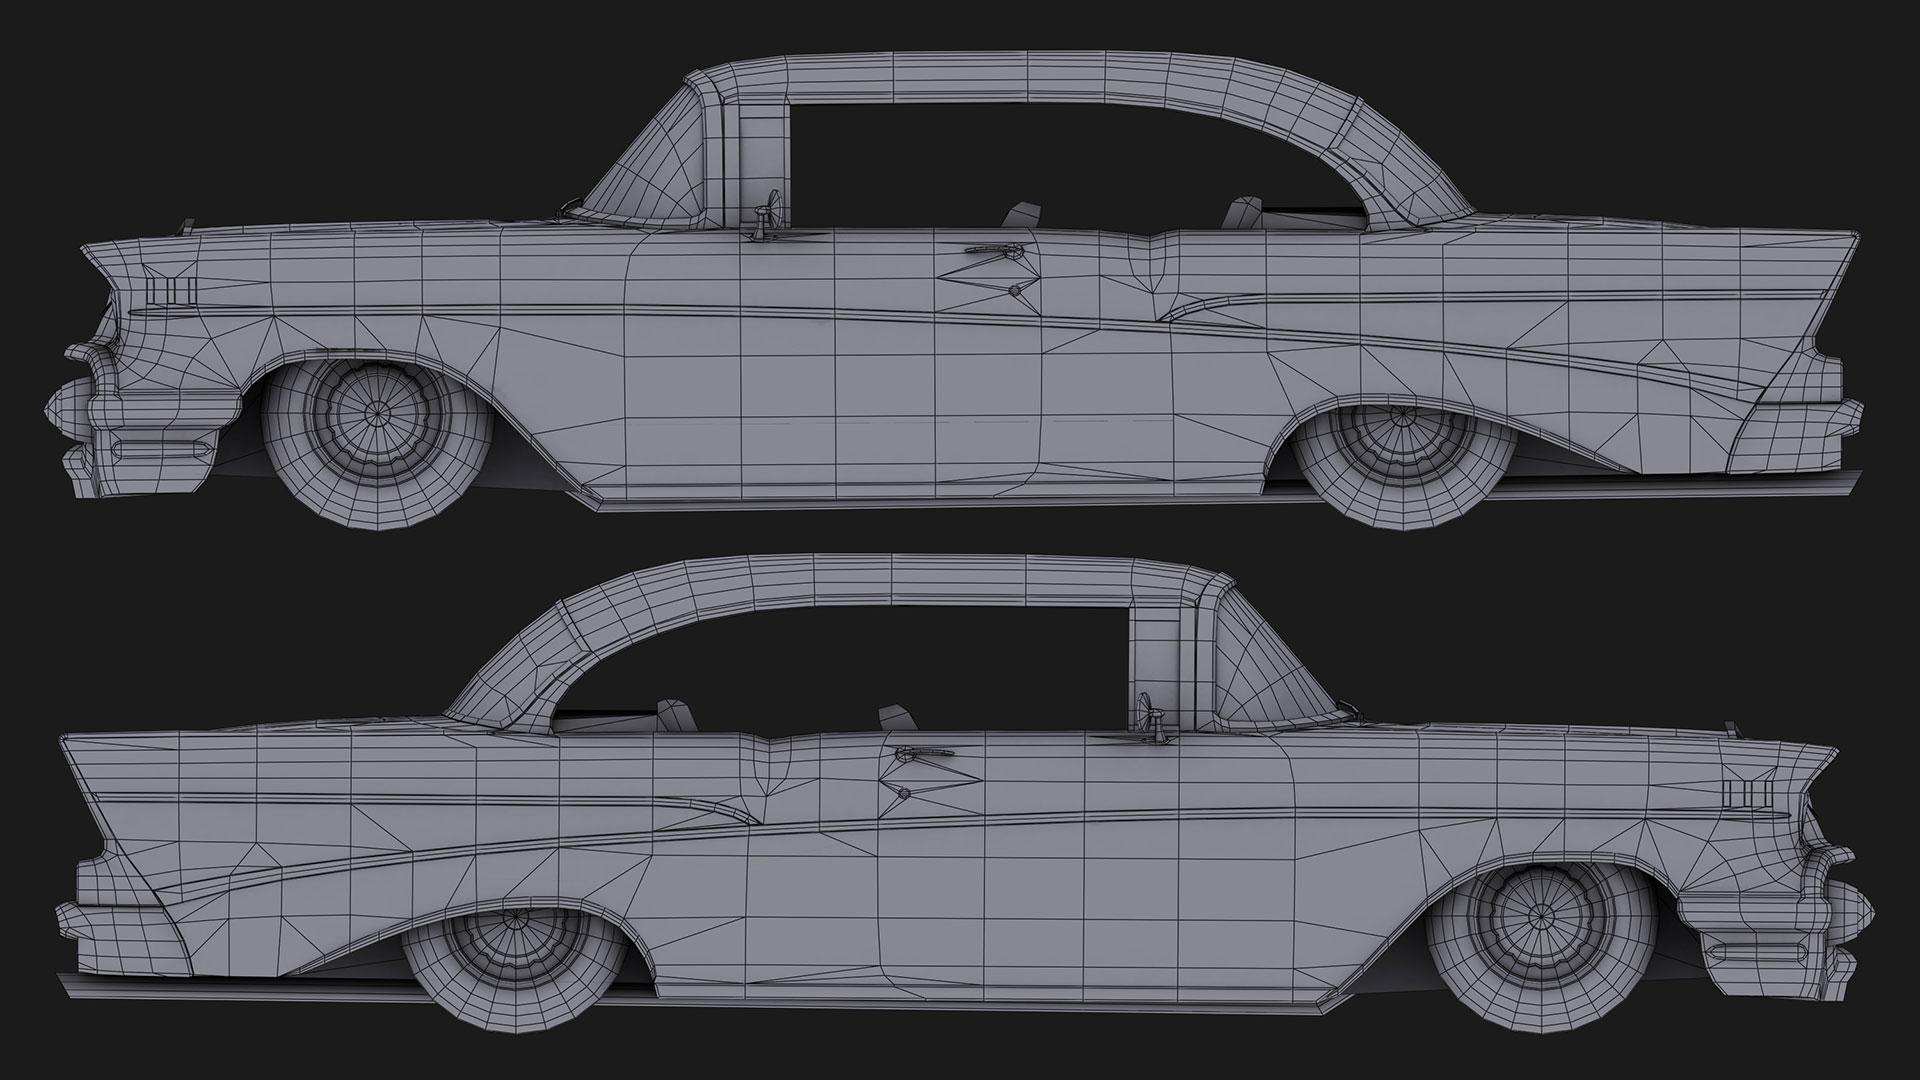 Chevrolet_Bel_Air_1957_Sides_Wireframe